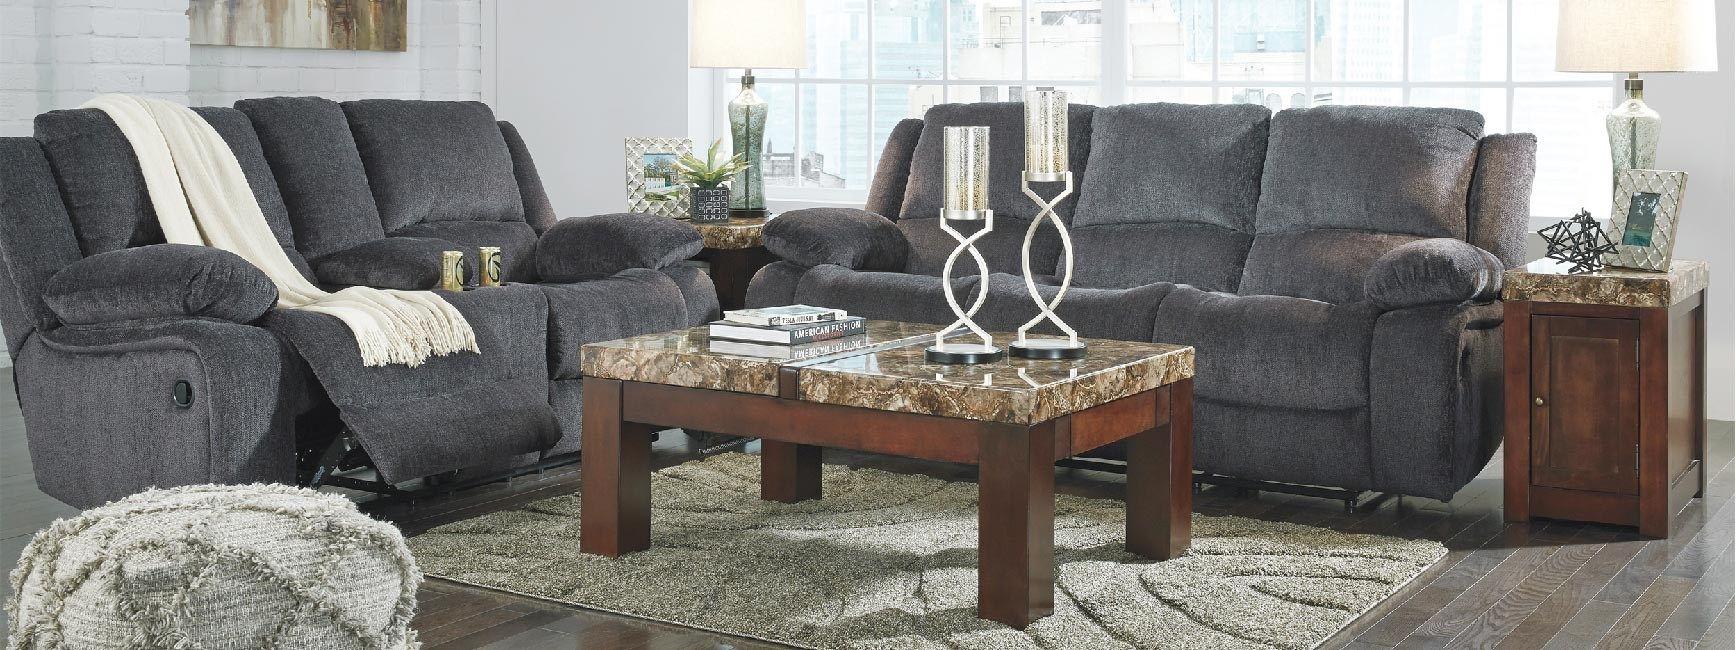 11 Smart Designs Of How To Make 3 Piece Living Room Set Cheap In 2021 Living Room Sets 3 Piece Living Room Set Room Set